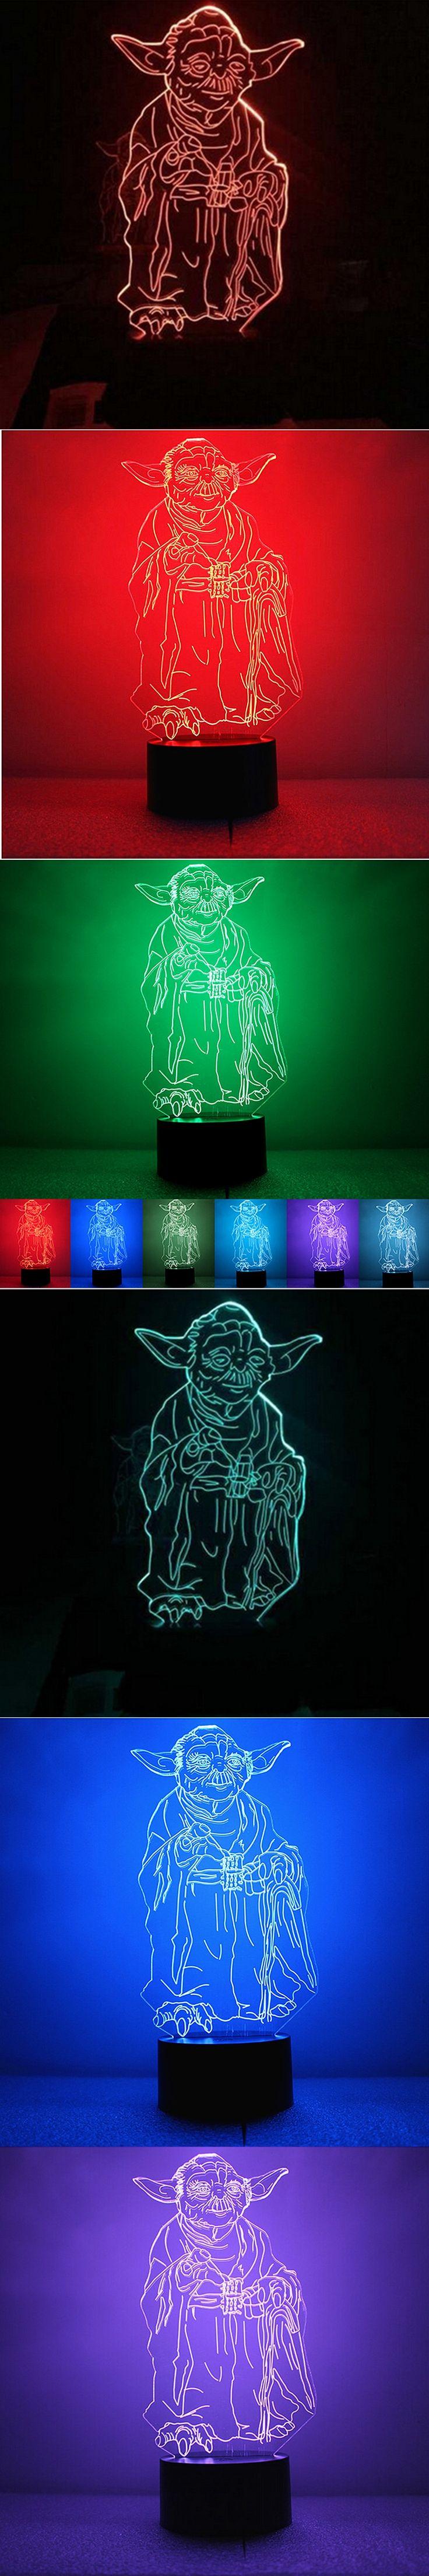 3D Bulb Led Light Master Yoda Night Lamp 7 Colors Changeable Table Light Desk Lamp for Kids Gifts